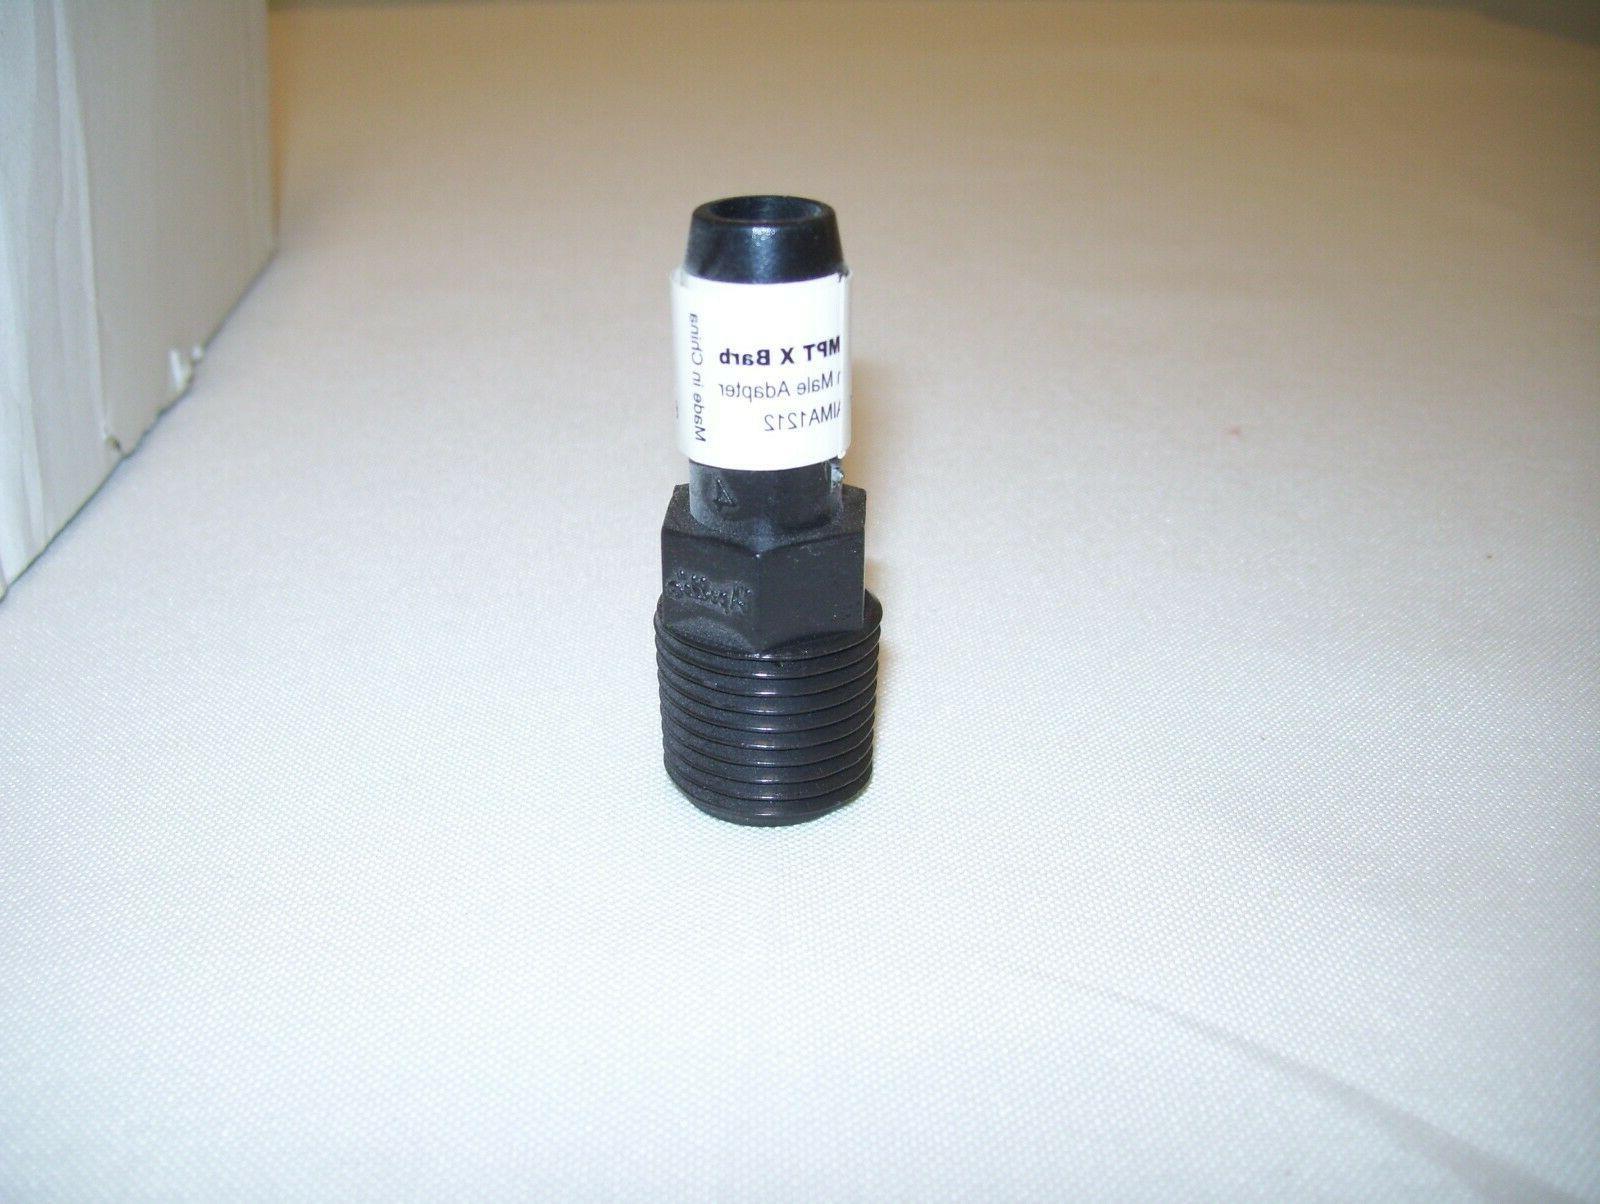 Apollo Male Adapter Barb Irrigation Tubing Polyethylene